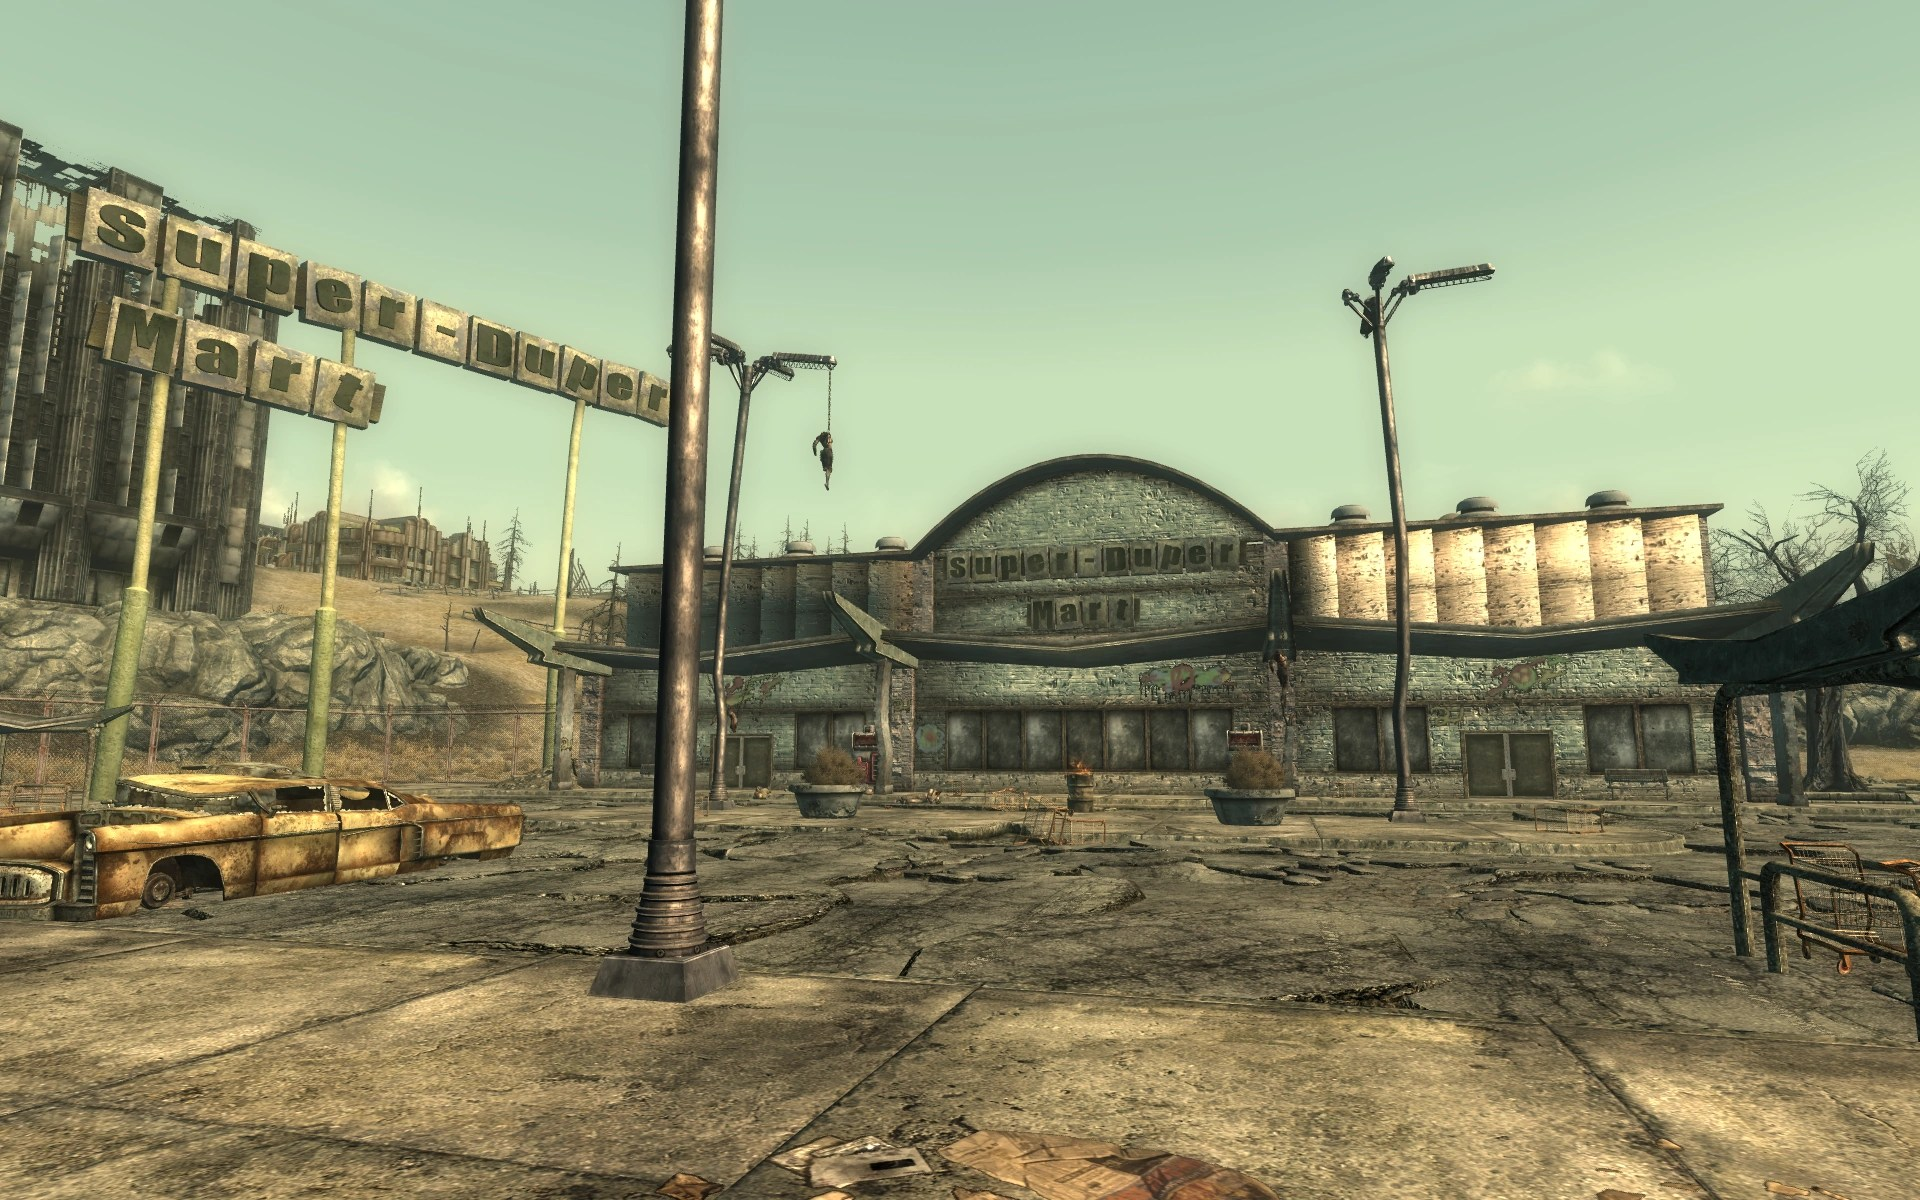 Wallpaper Removal Post Falls Super Duper Mart The Fallout Wiki Fallout New Vegas